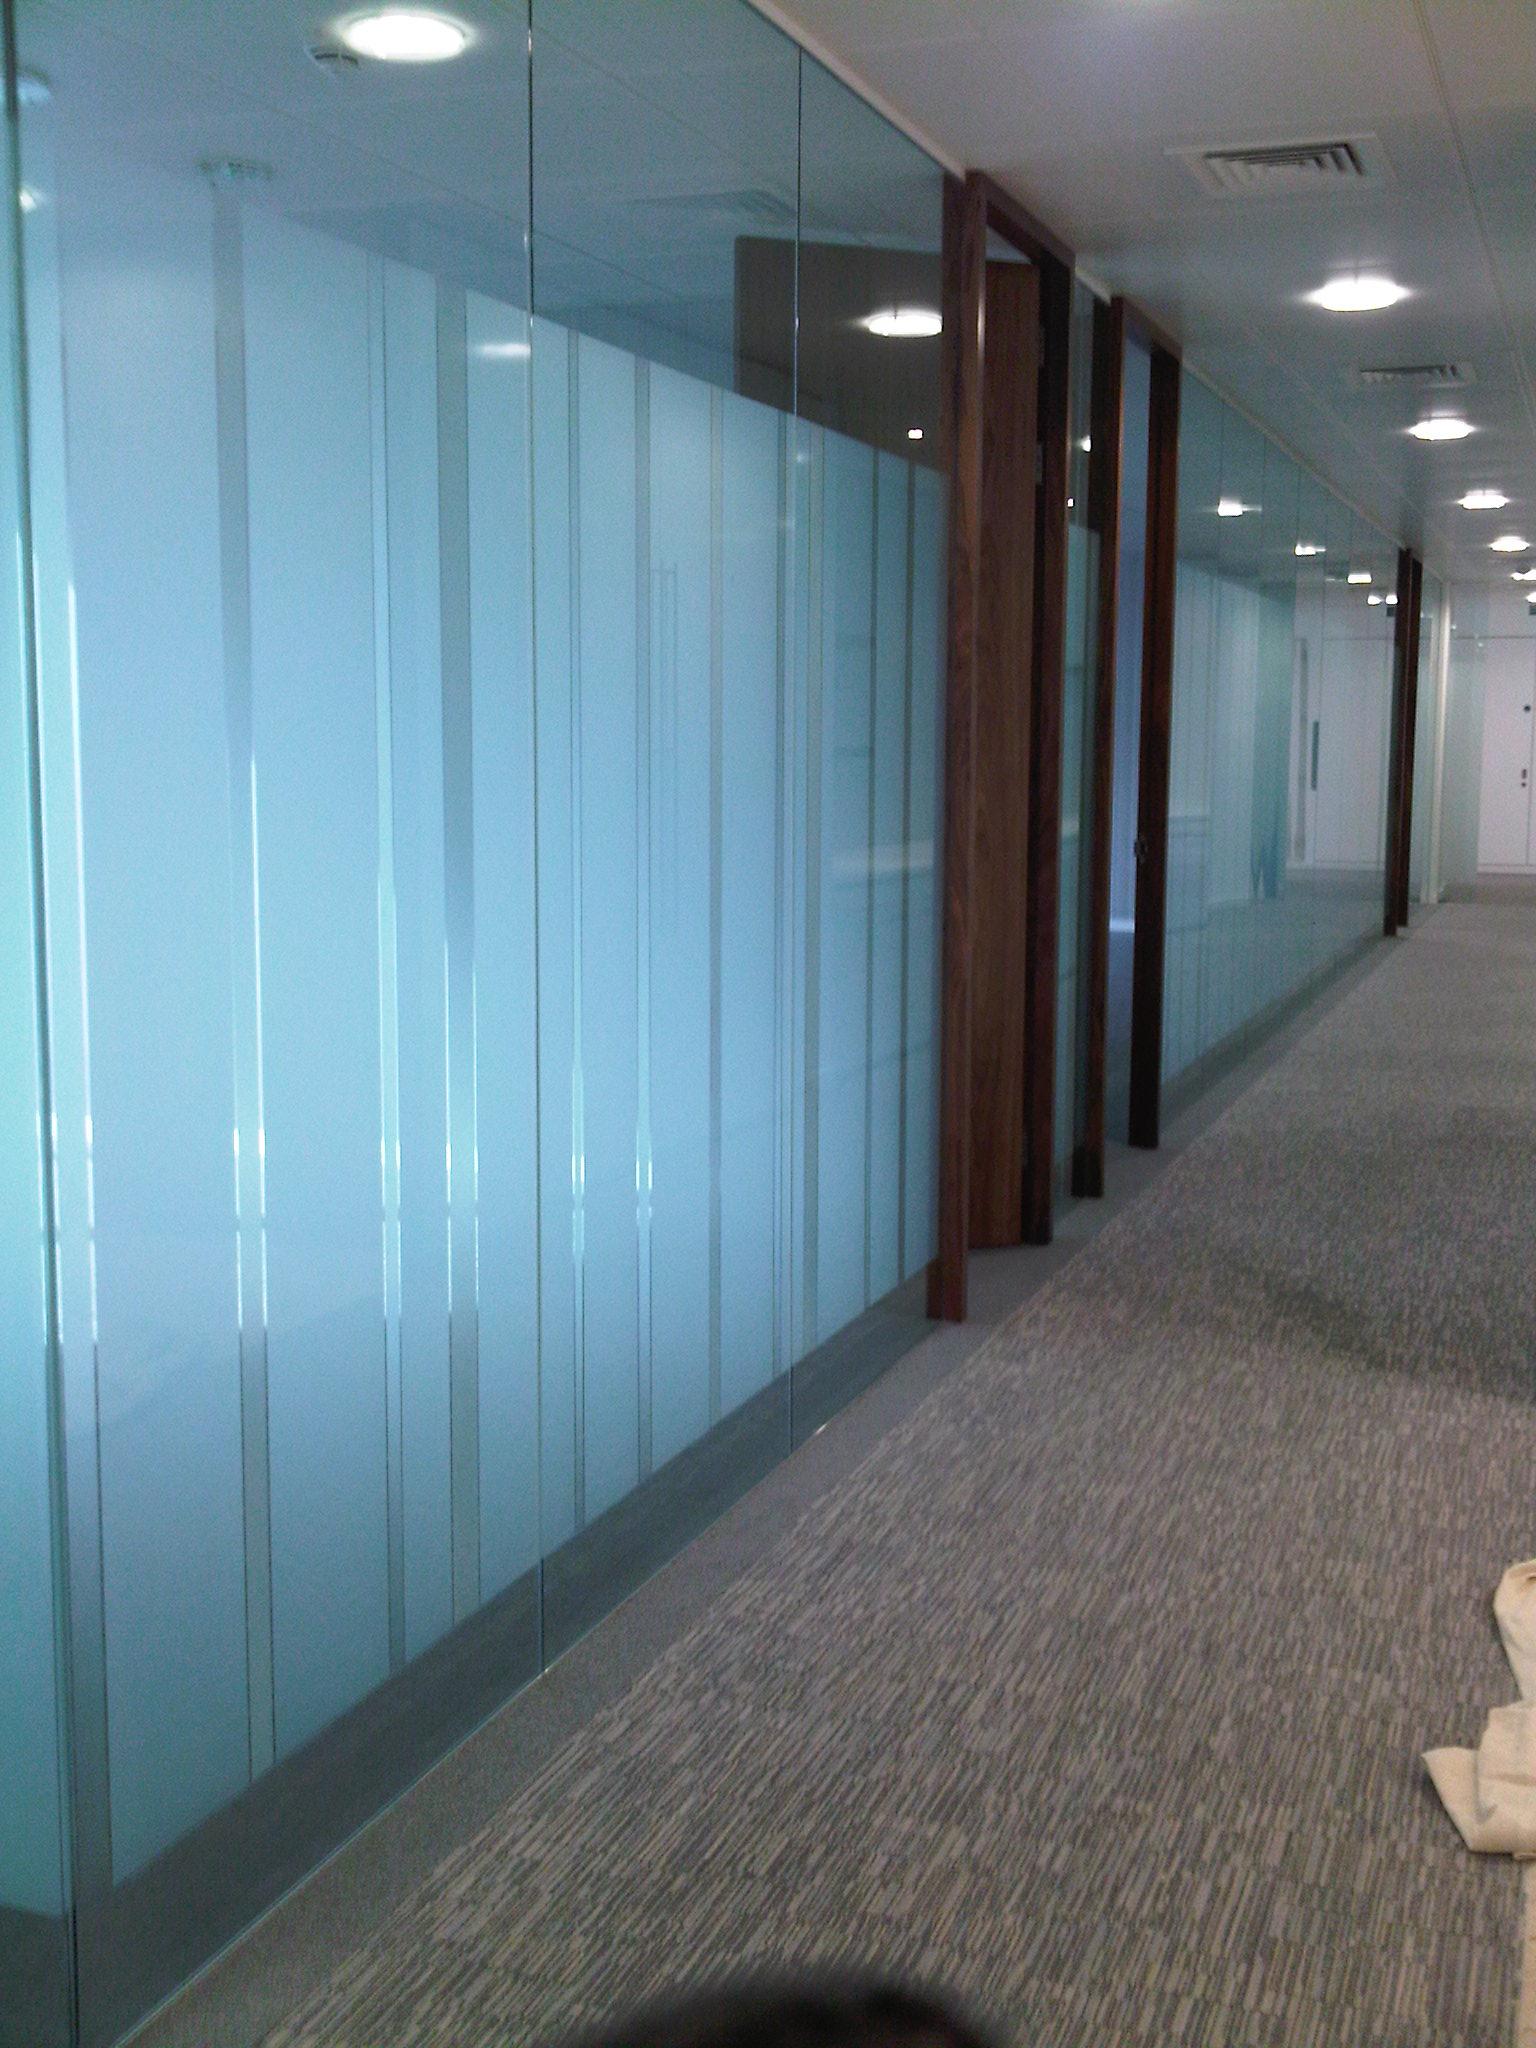 Meeting Room Stripes